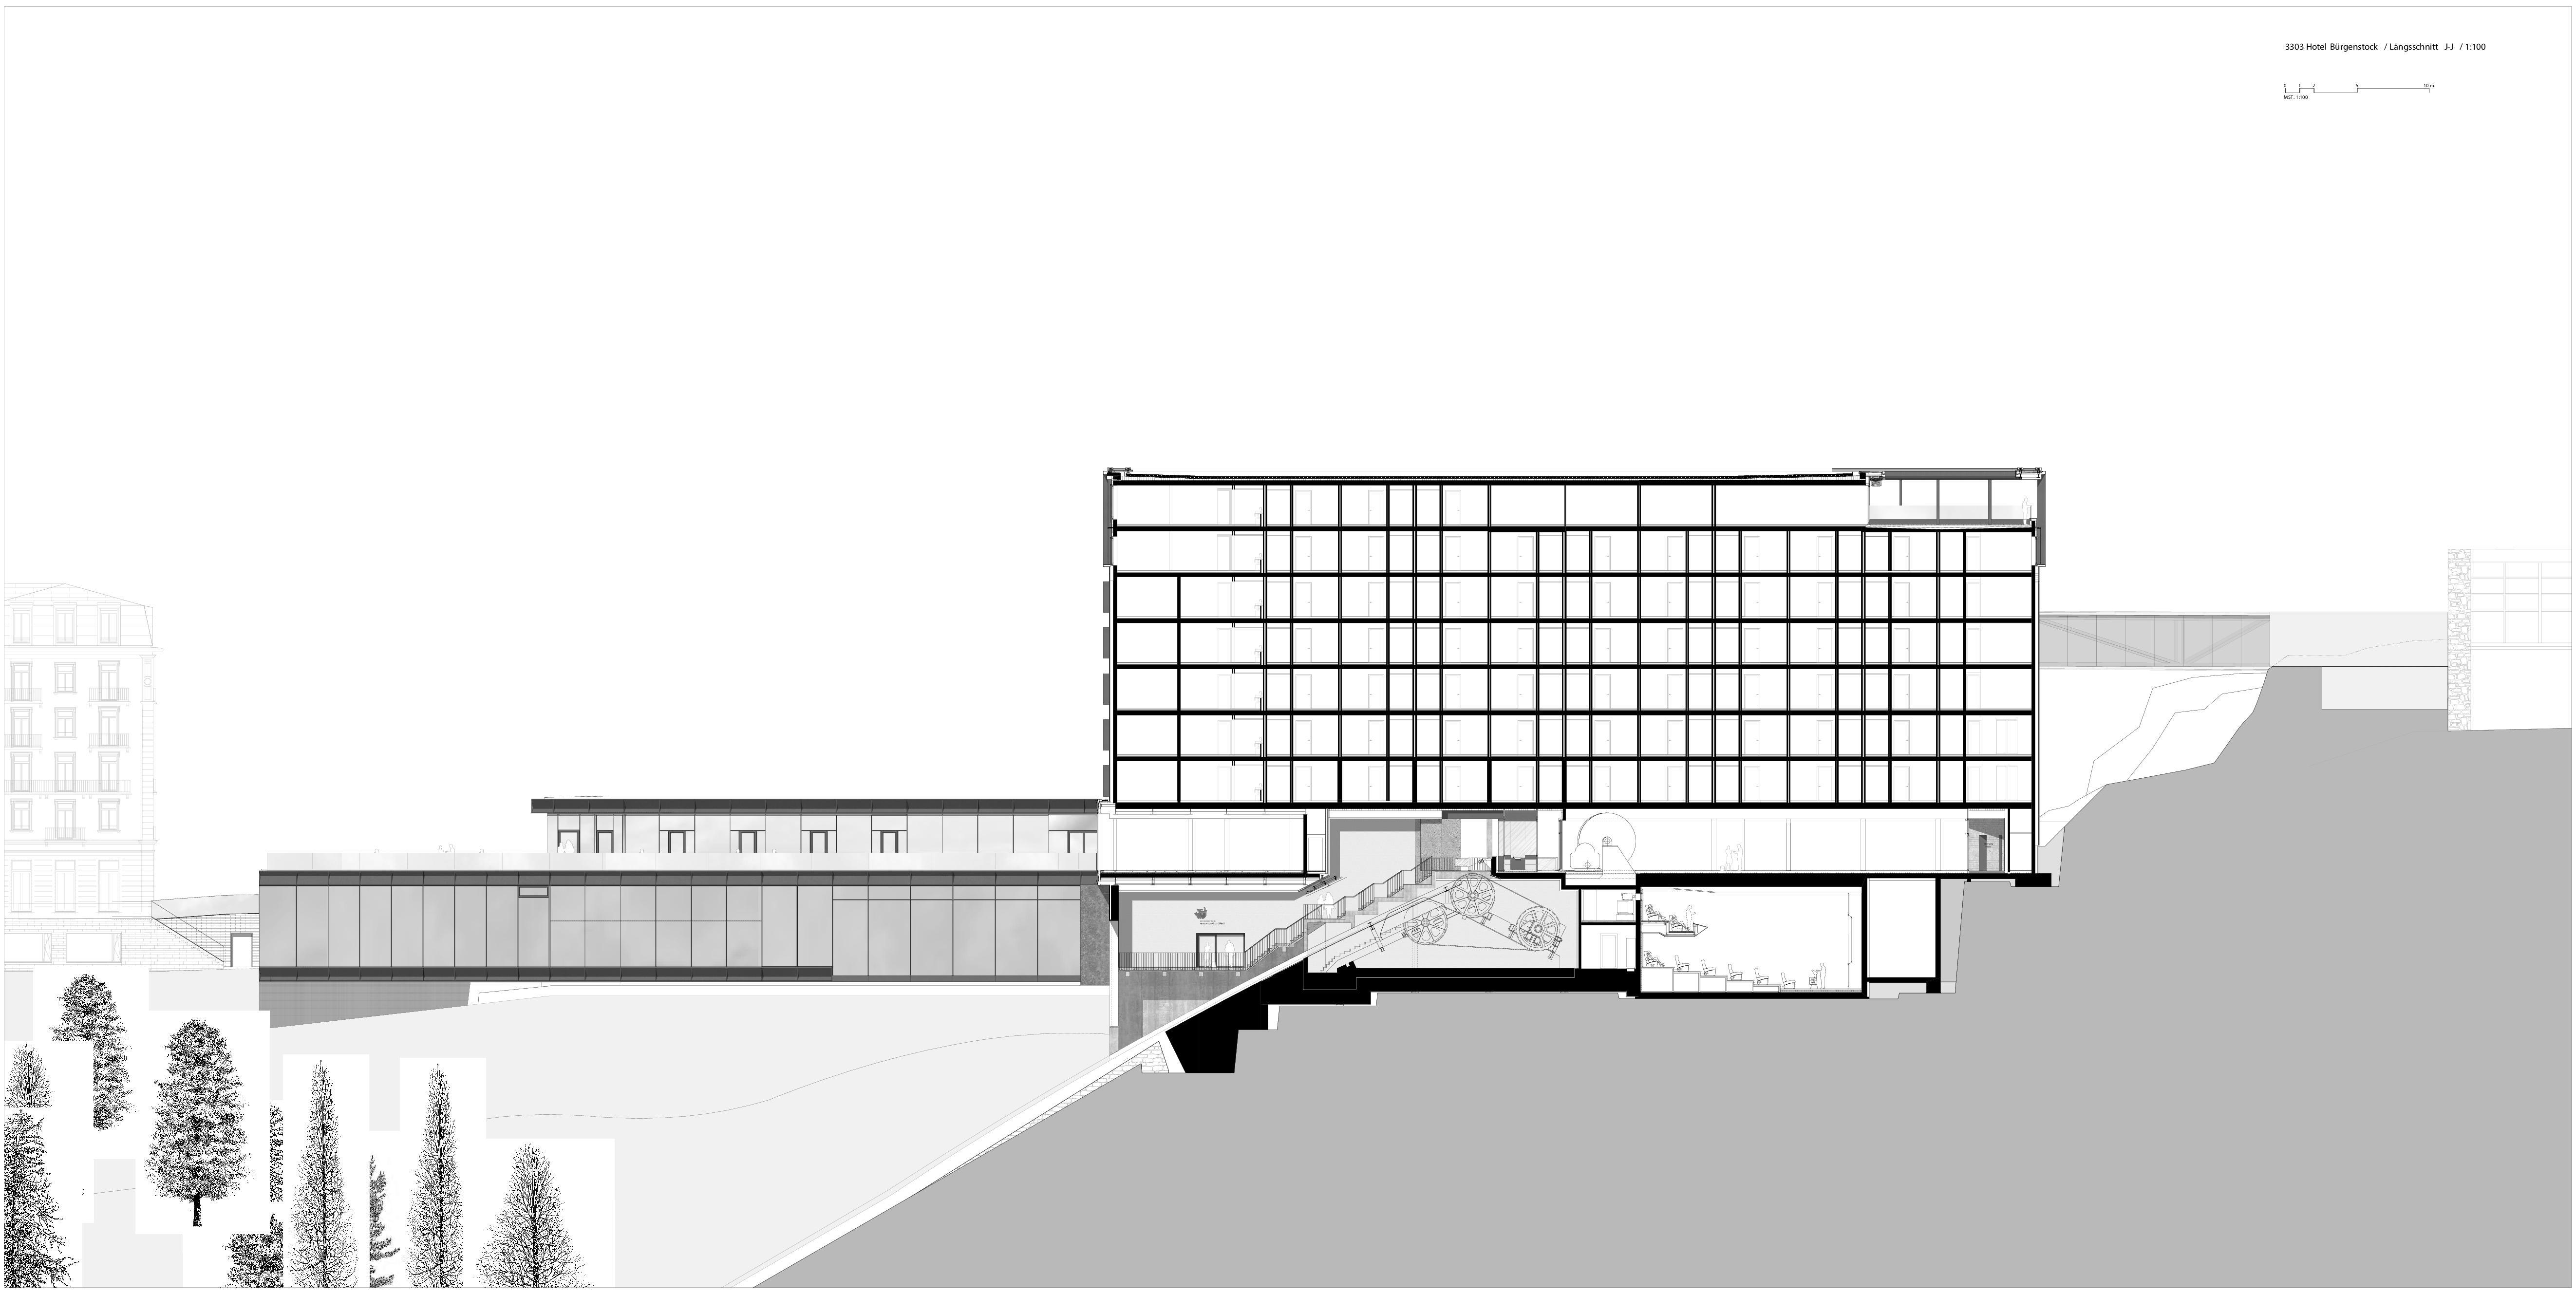 Coupe longitudinale J BÜRGENSTOCK HOTEL 5*SUPERIOR  de Dipl. Arch. ETH SIA<br/>